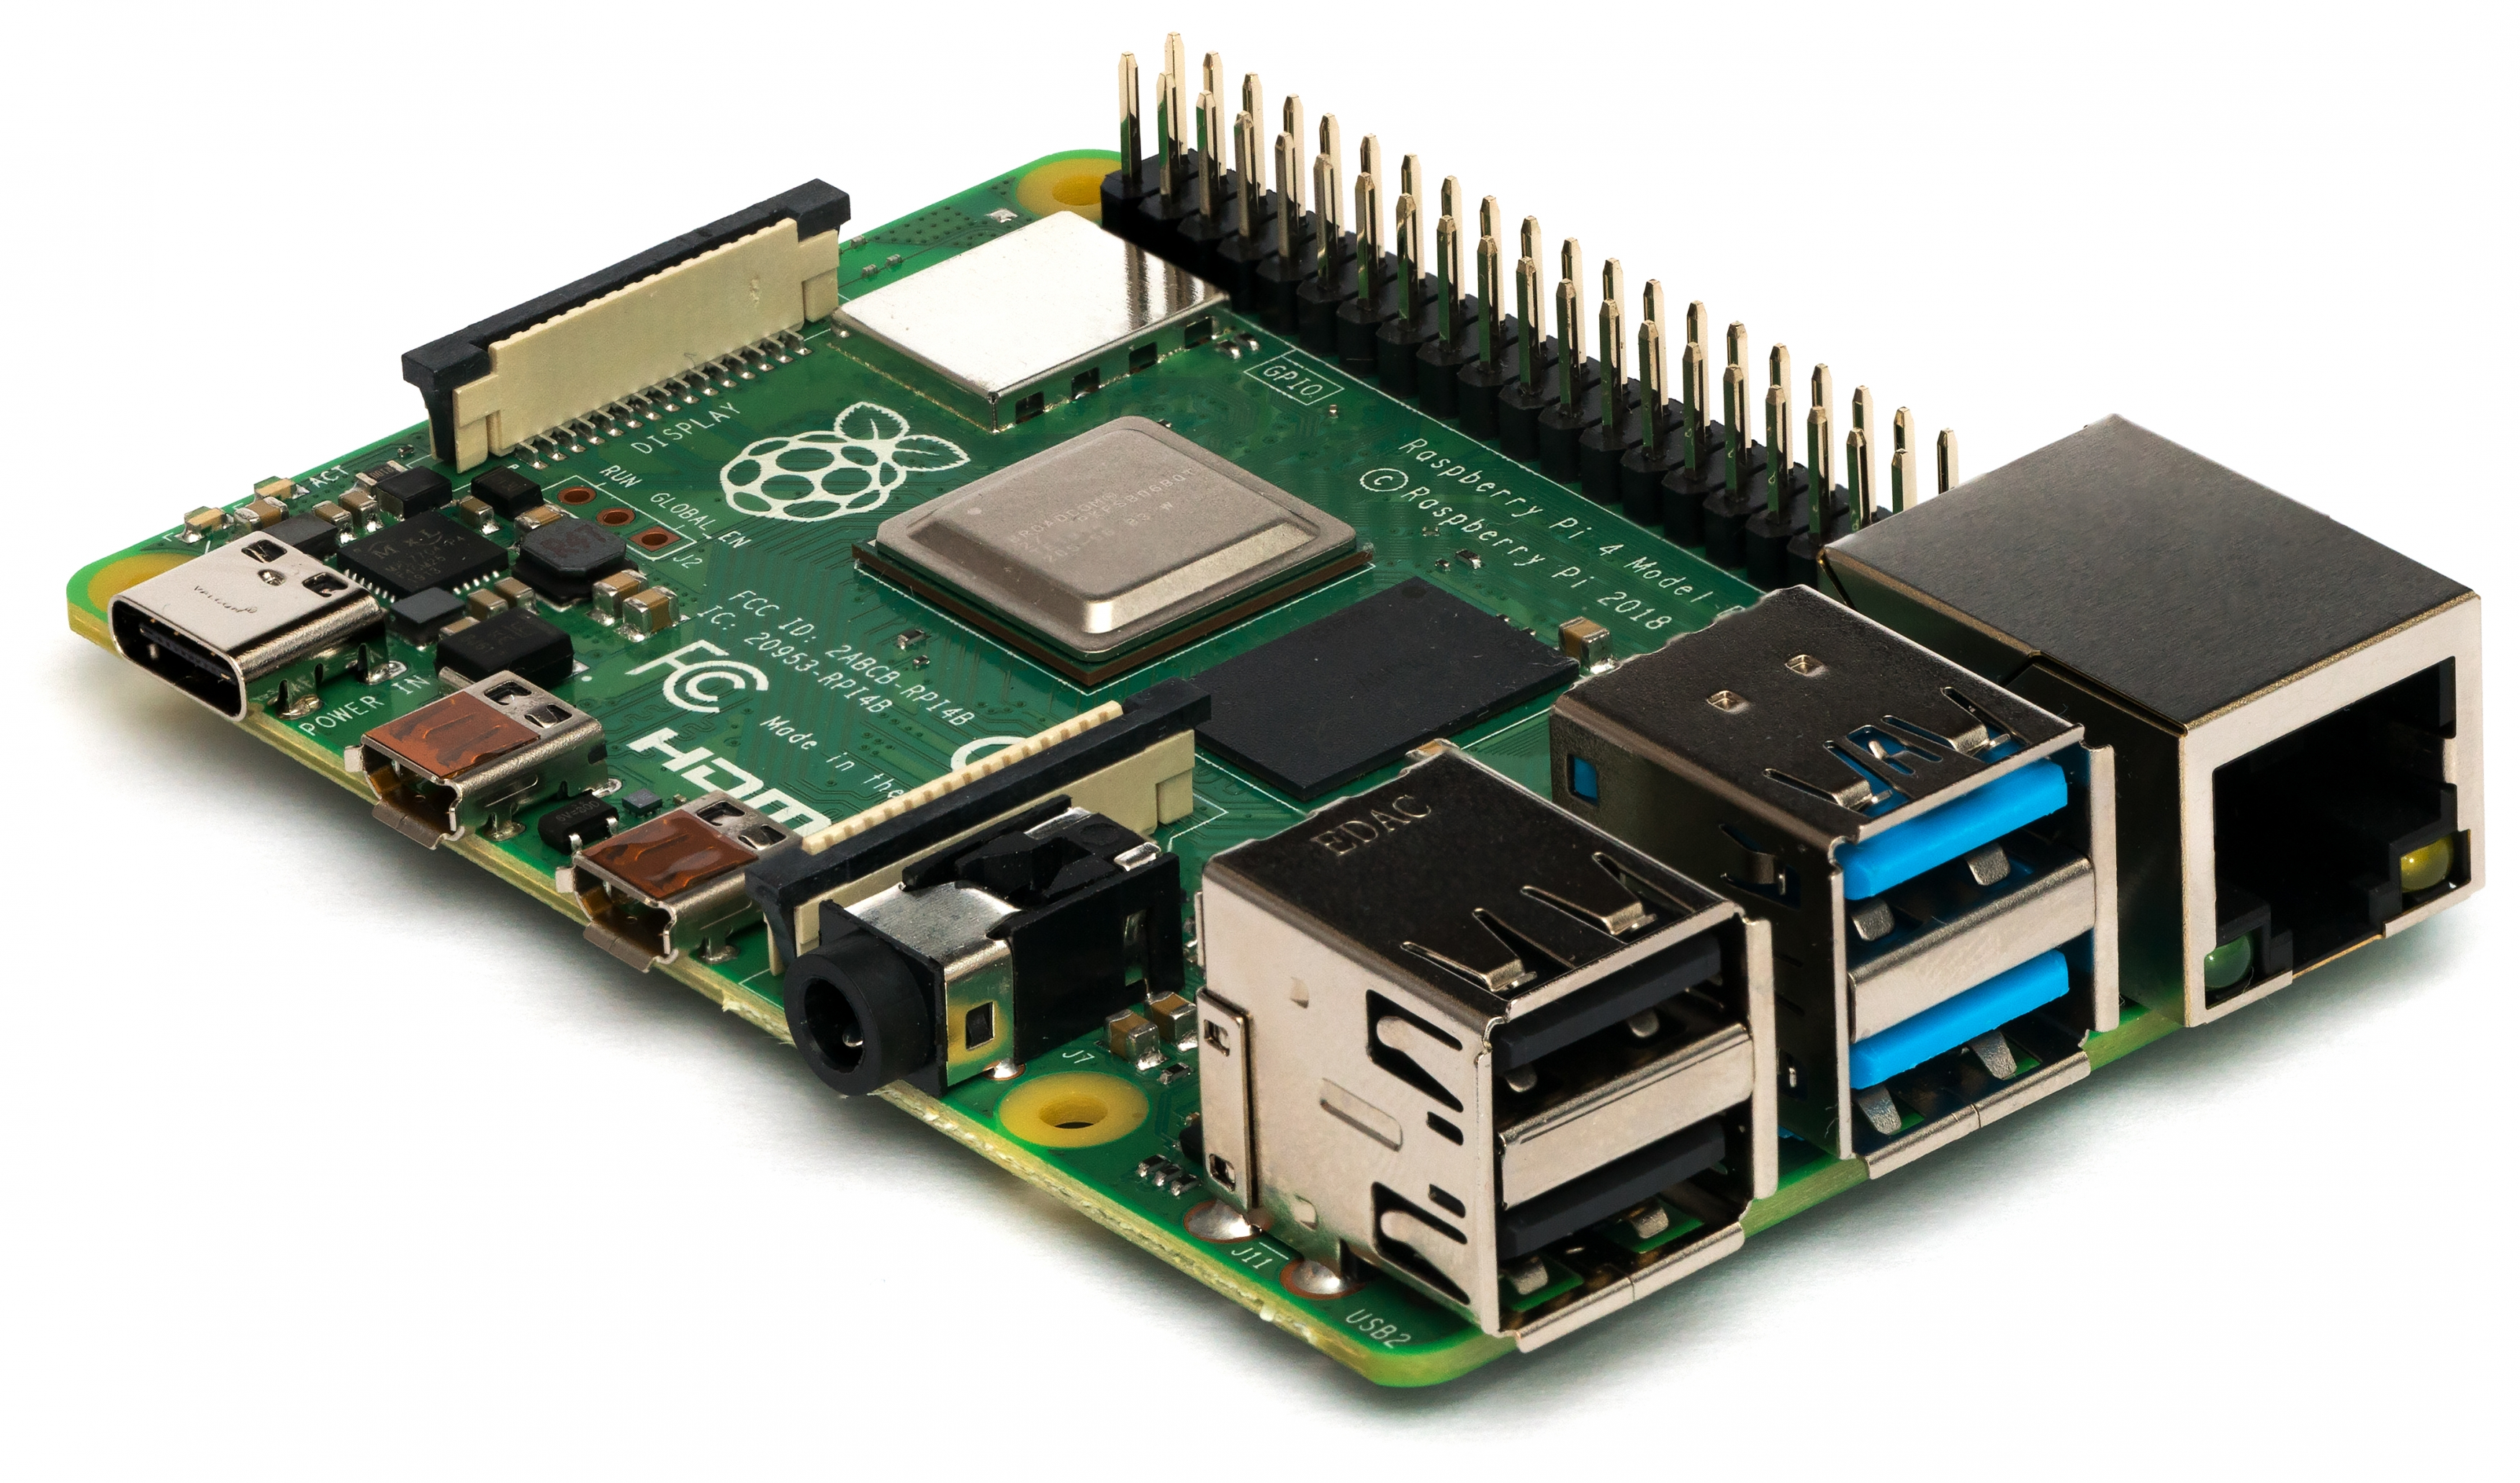 Raspberry SD cards